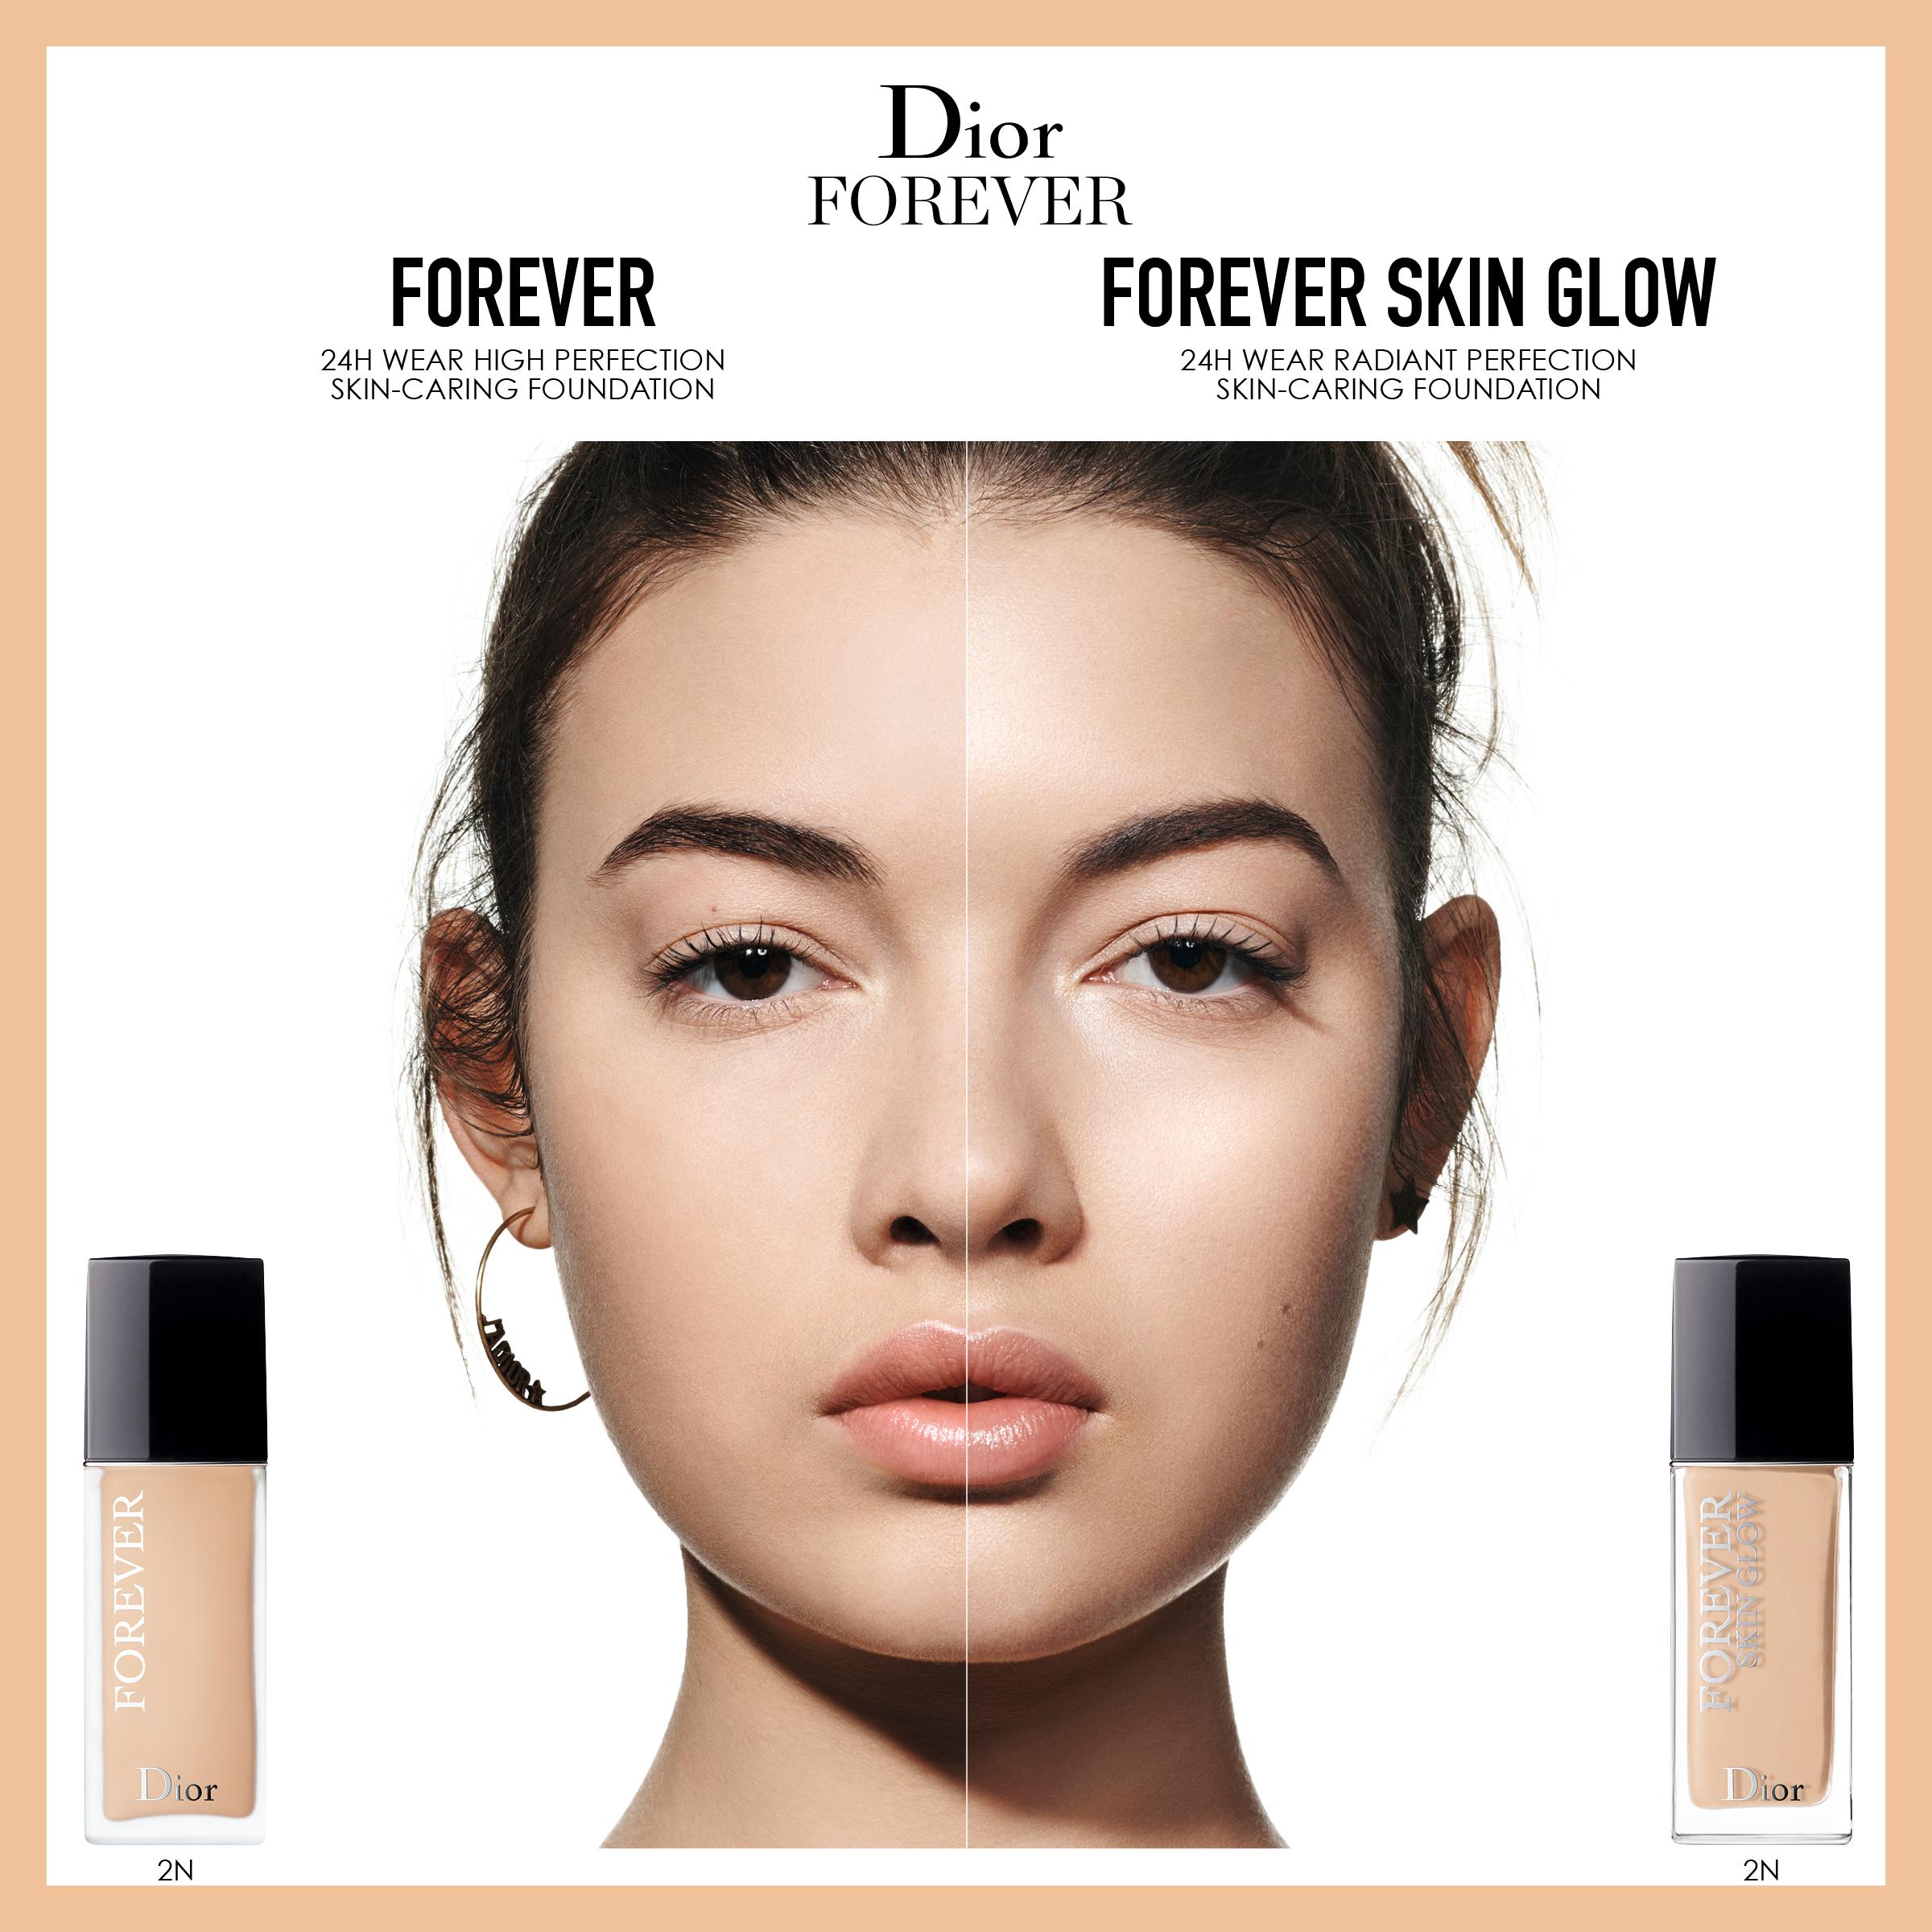 DIOR Forever Skin Glow Foundation, 3 Warm Olive